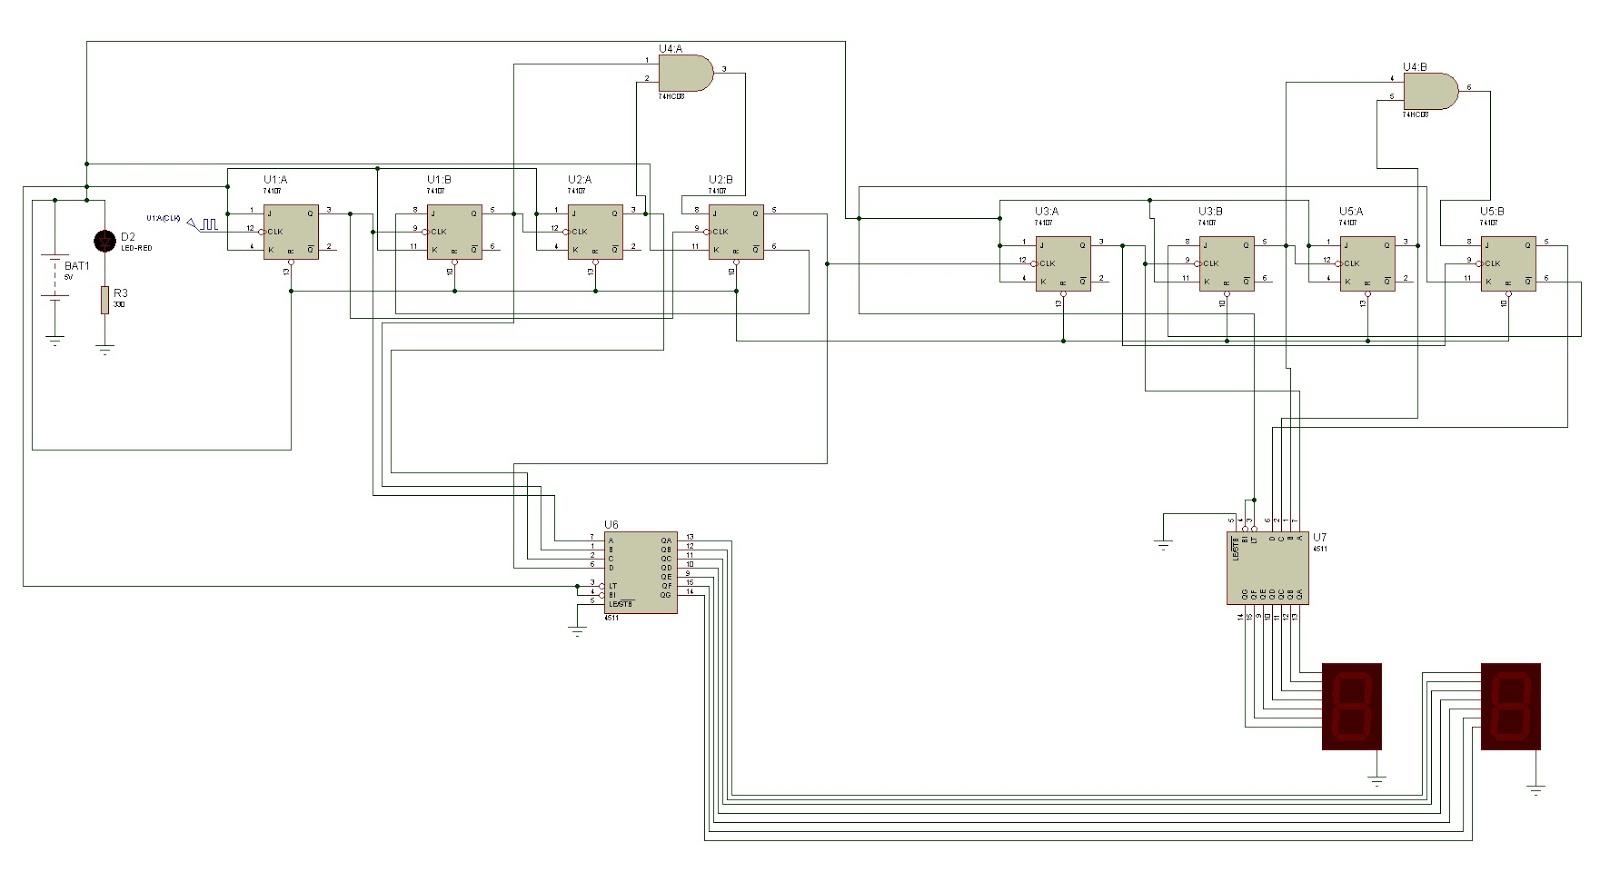 medium resolution of 0 99 counter circuit with jk flip flop